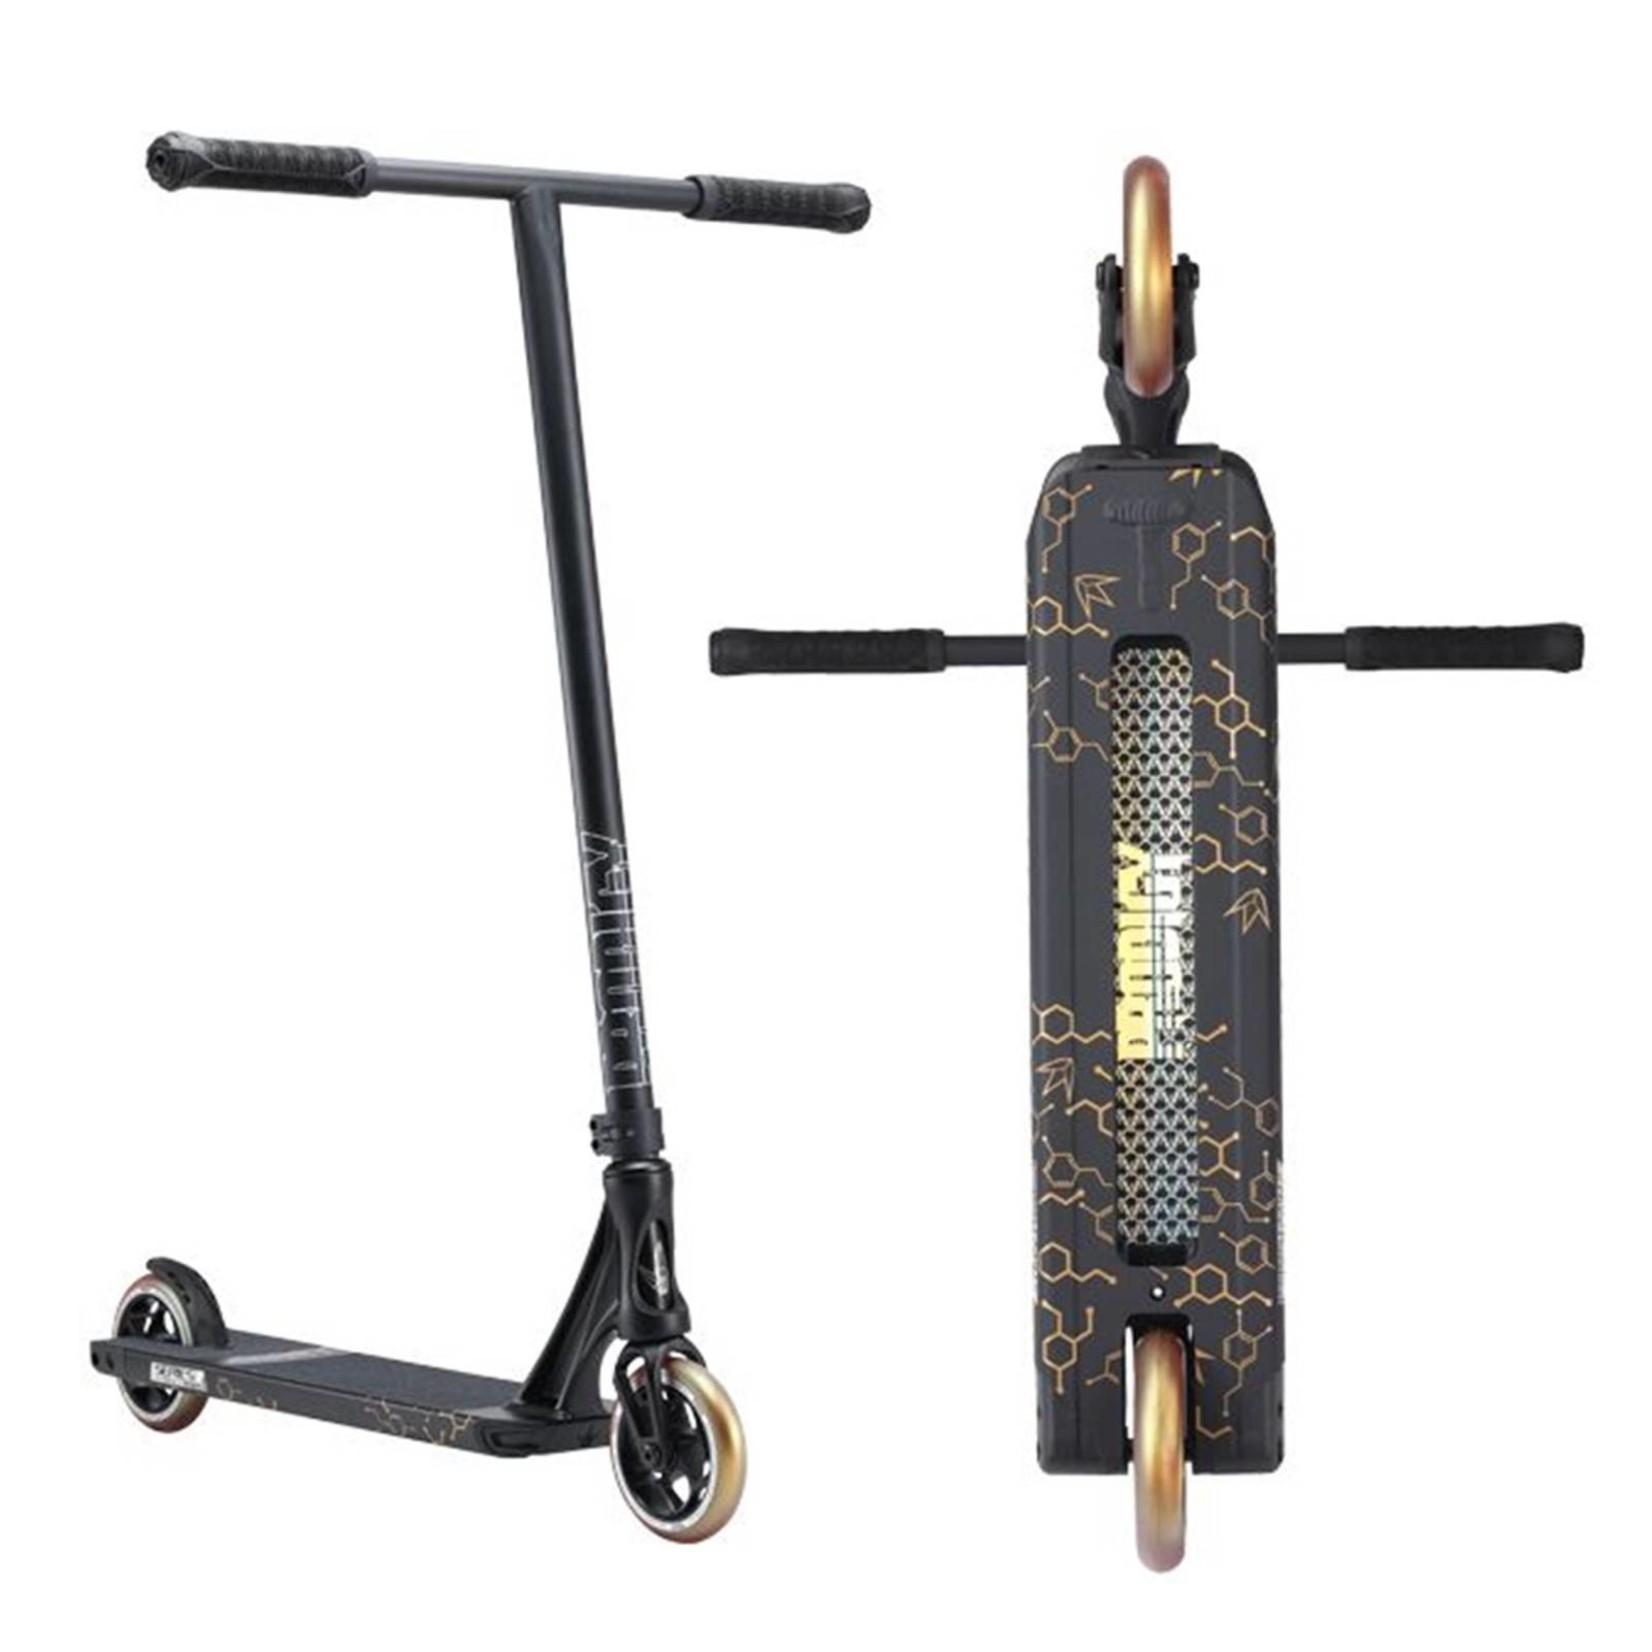 ENVY Envy Prodigy S8 Street Scooter Black